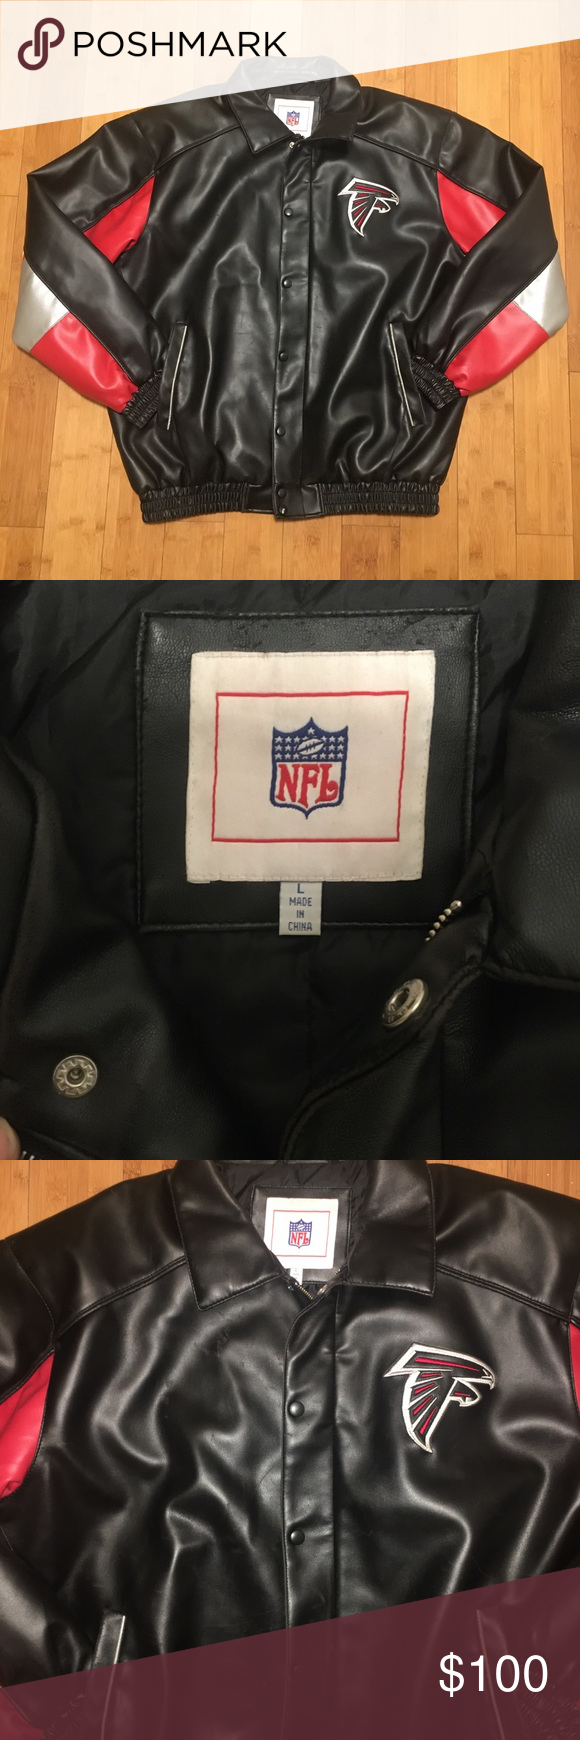 Atlanta Falcons Leather Jacket Leather Jacket Jackets Atlanta Falcons [ 1740 x 580 Pixel ]